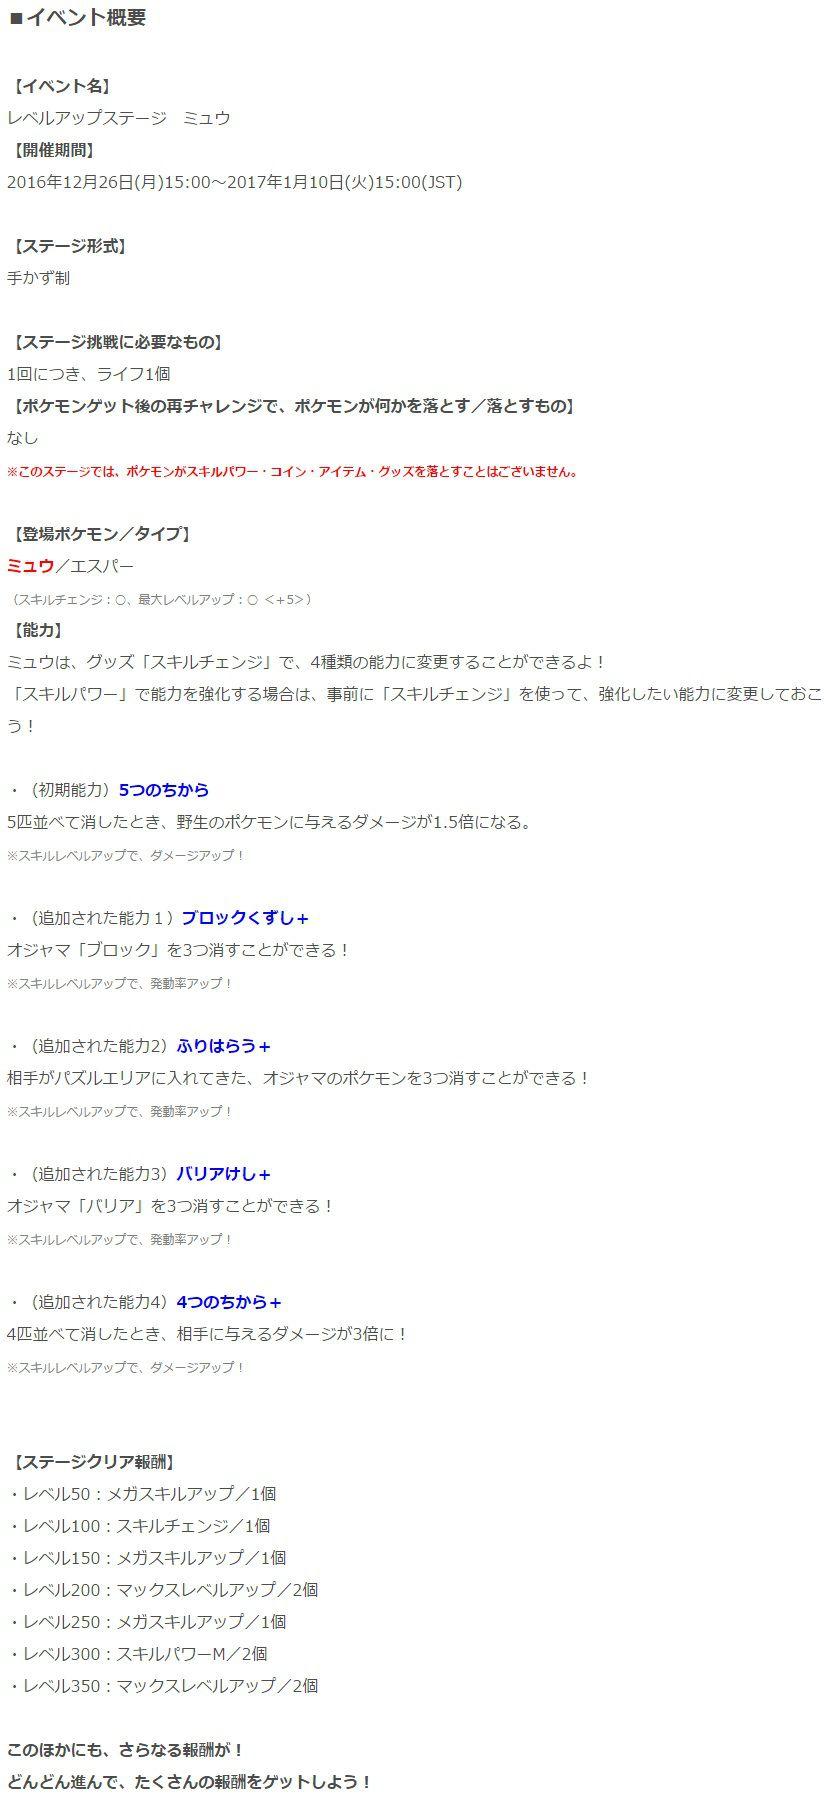 image_7718.jpg